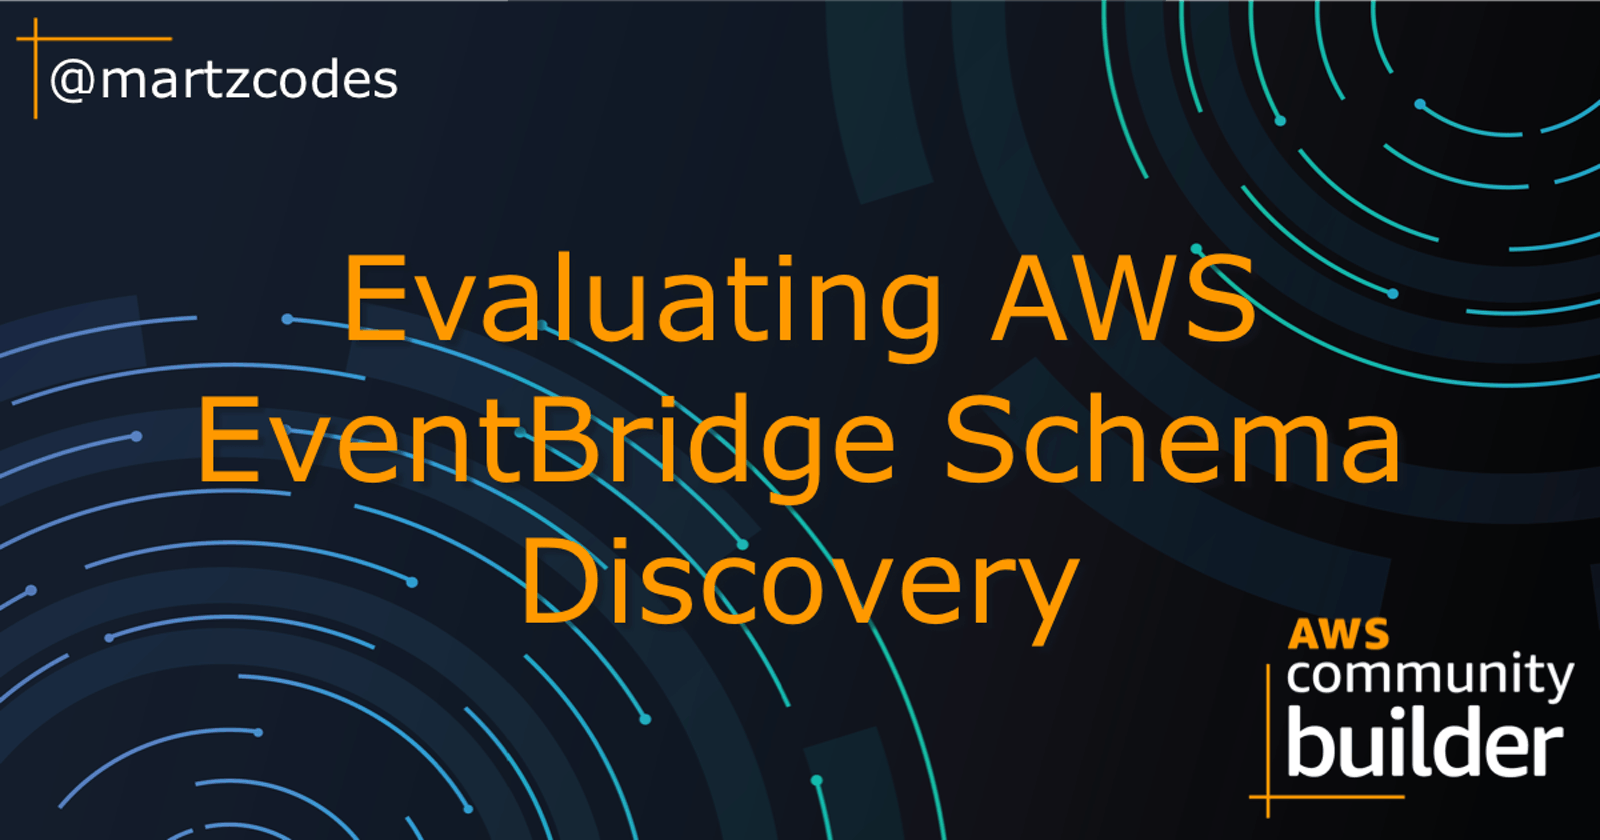 Evaluating AWS EventBridge Schema Discovery